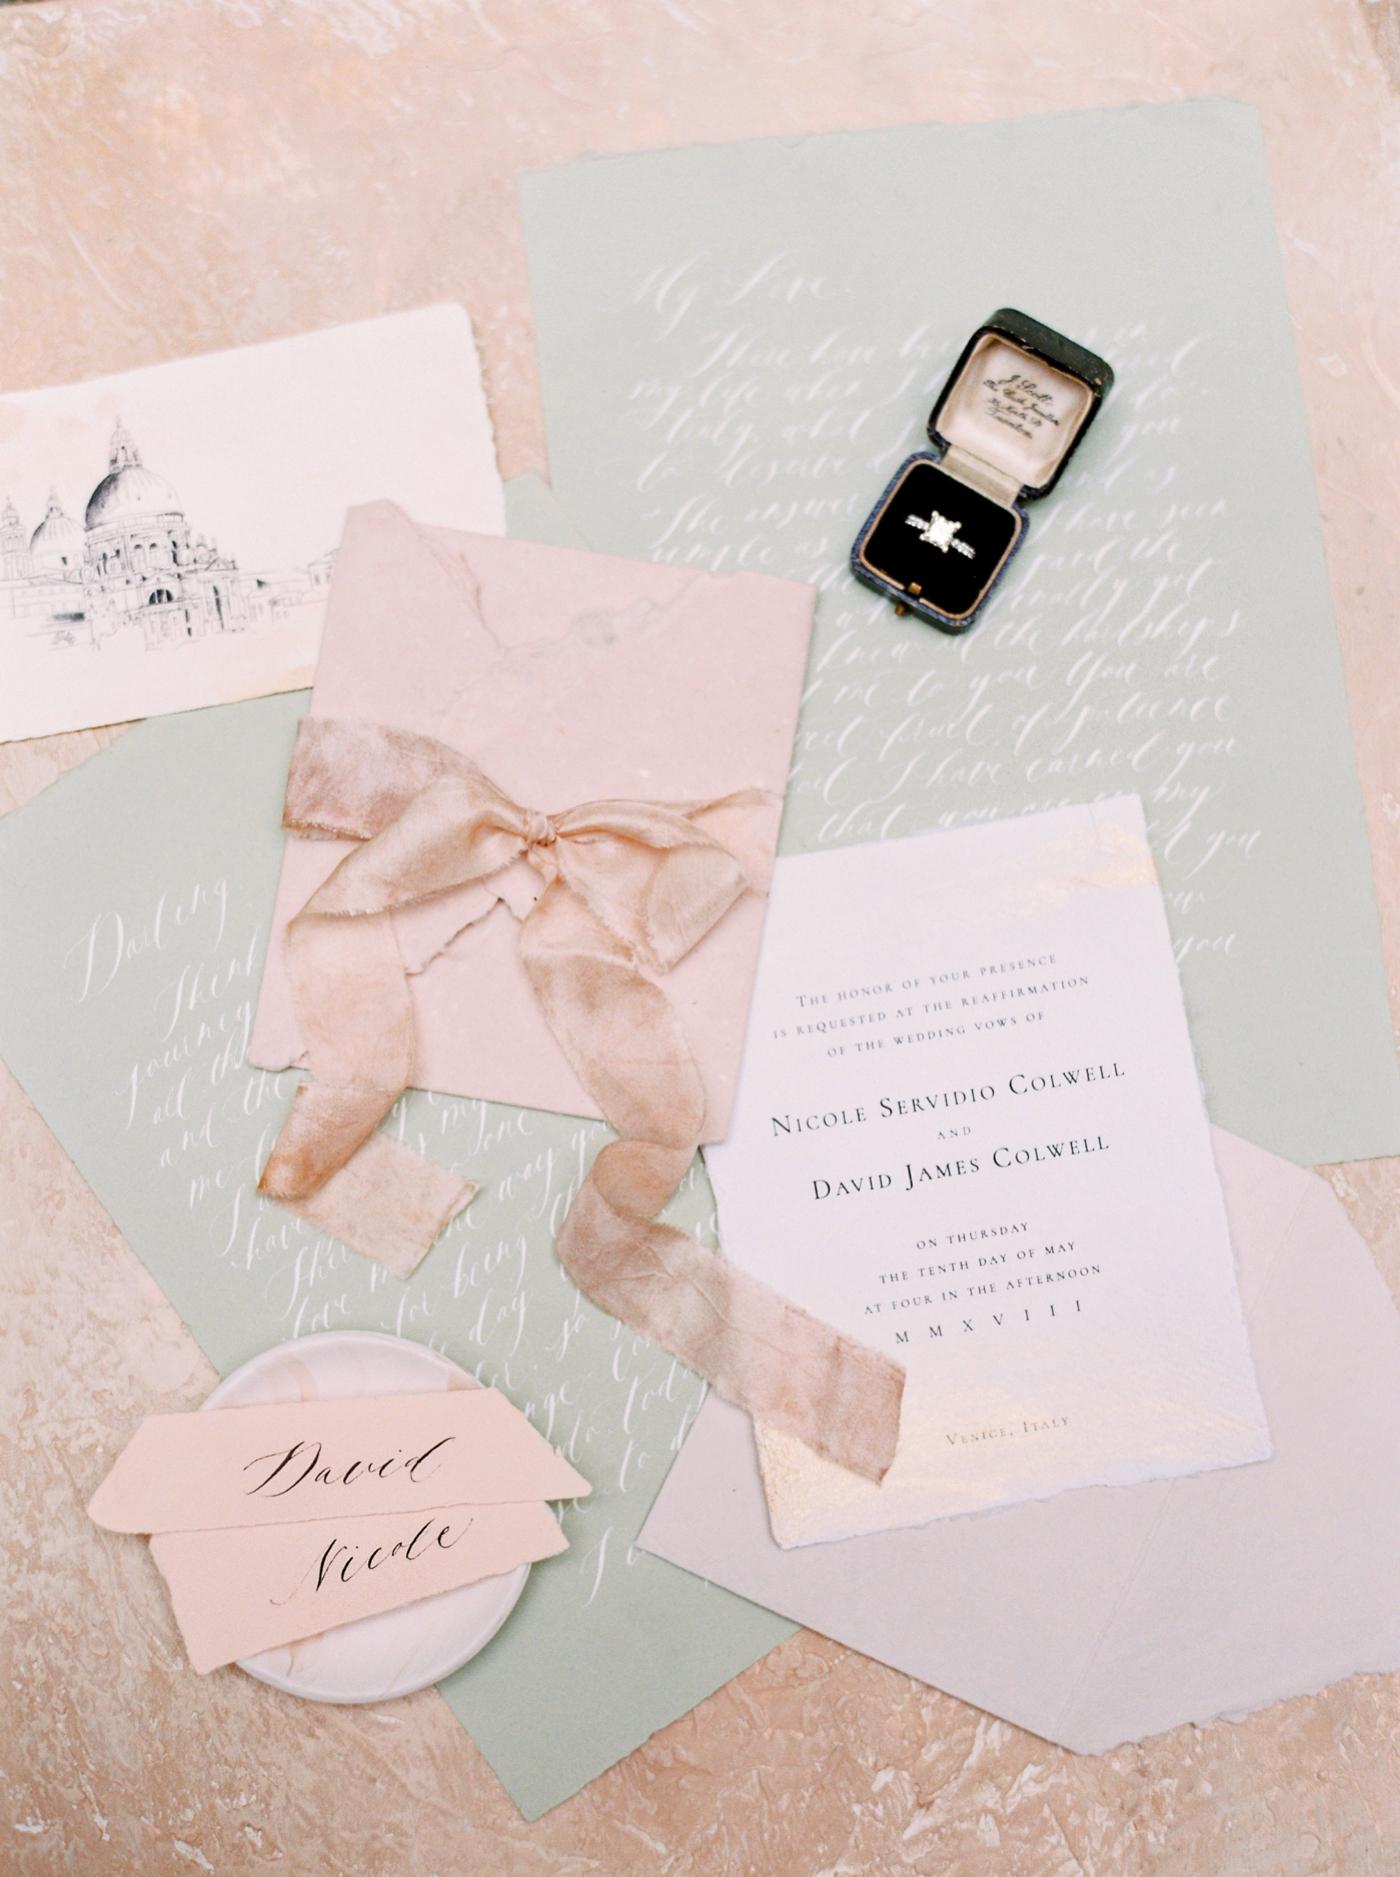 Venice italy wedding photographers | long sleeve wedding dress | italy vow renewal | justine milton fine art film photographer | wedding stationery details